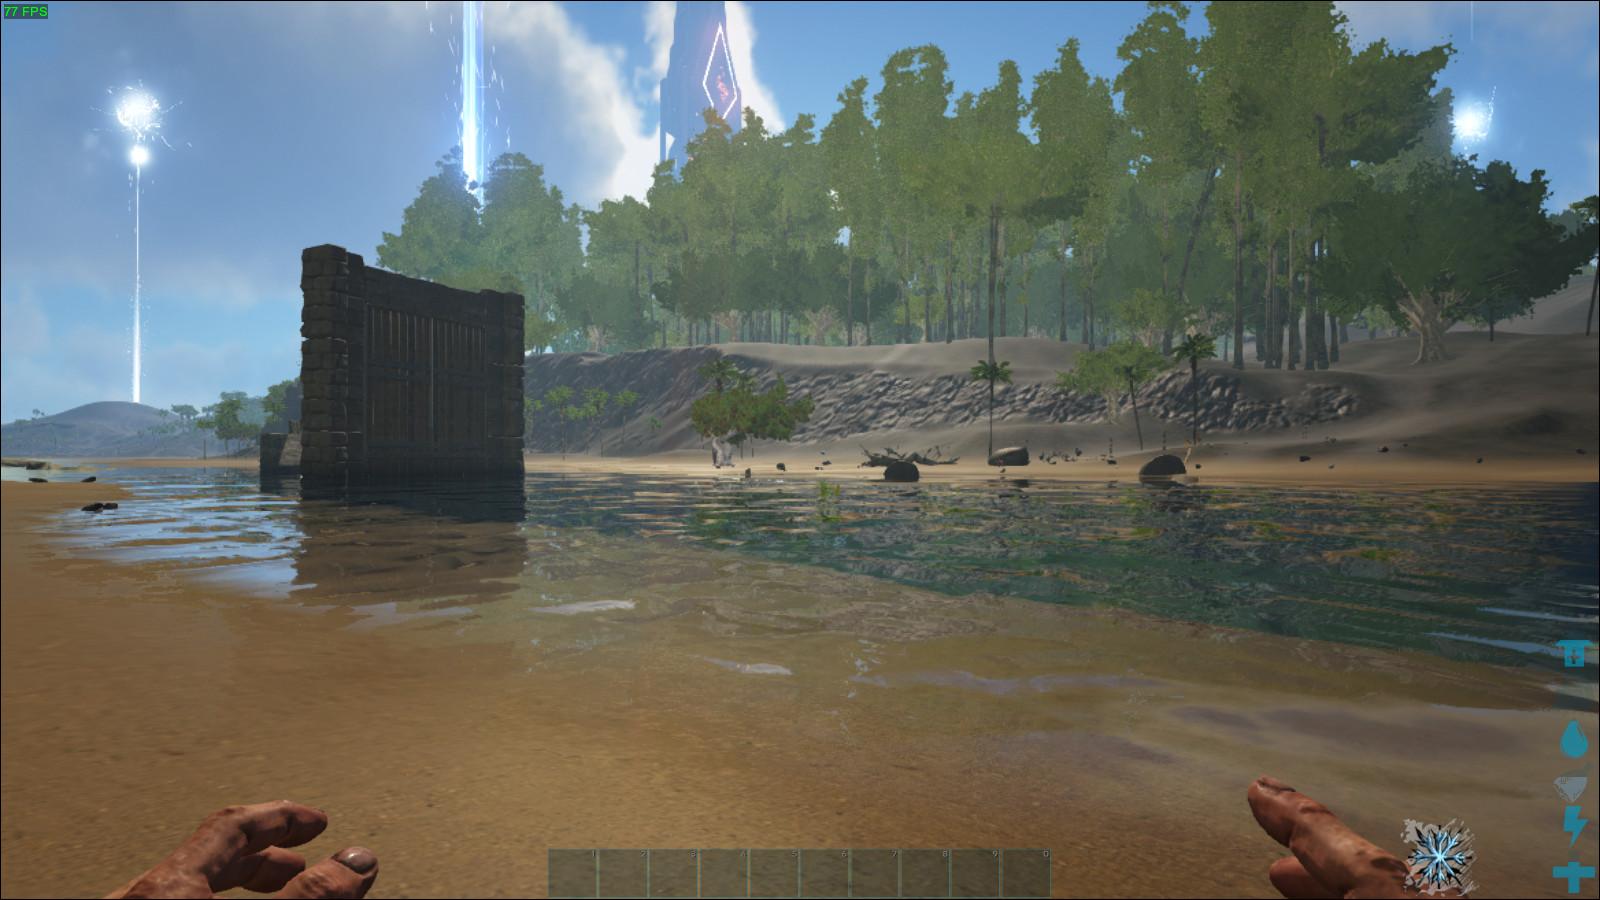 ark survival evolved free trial length